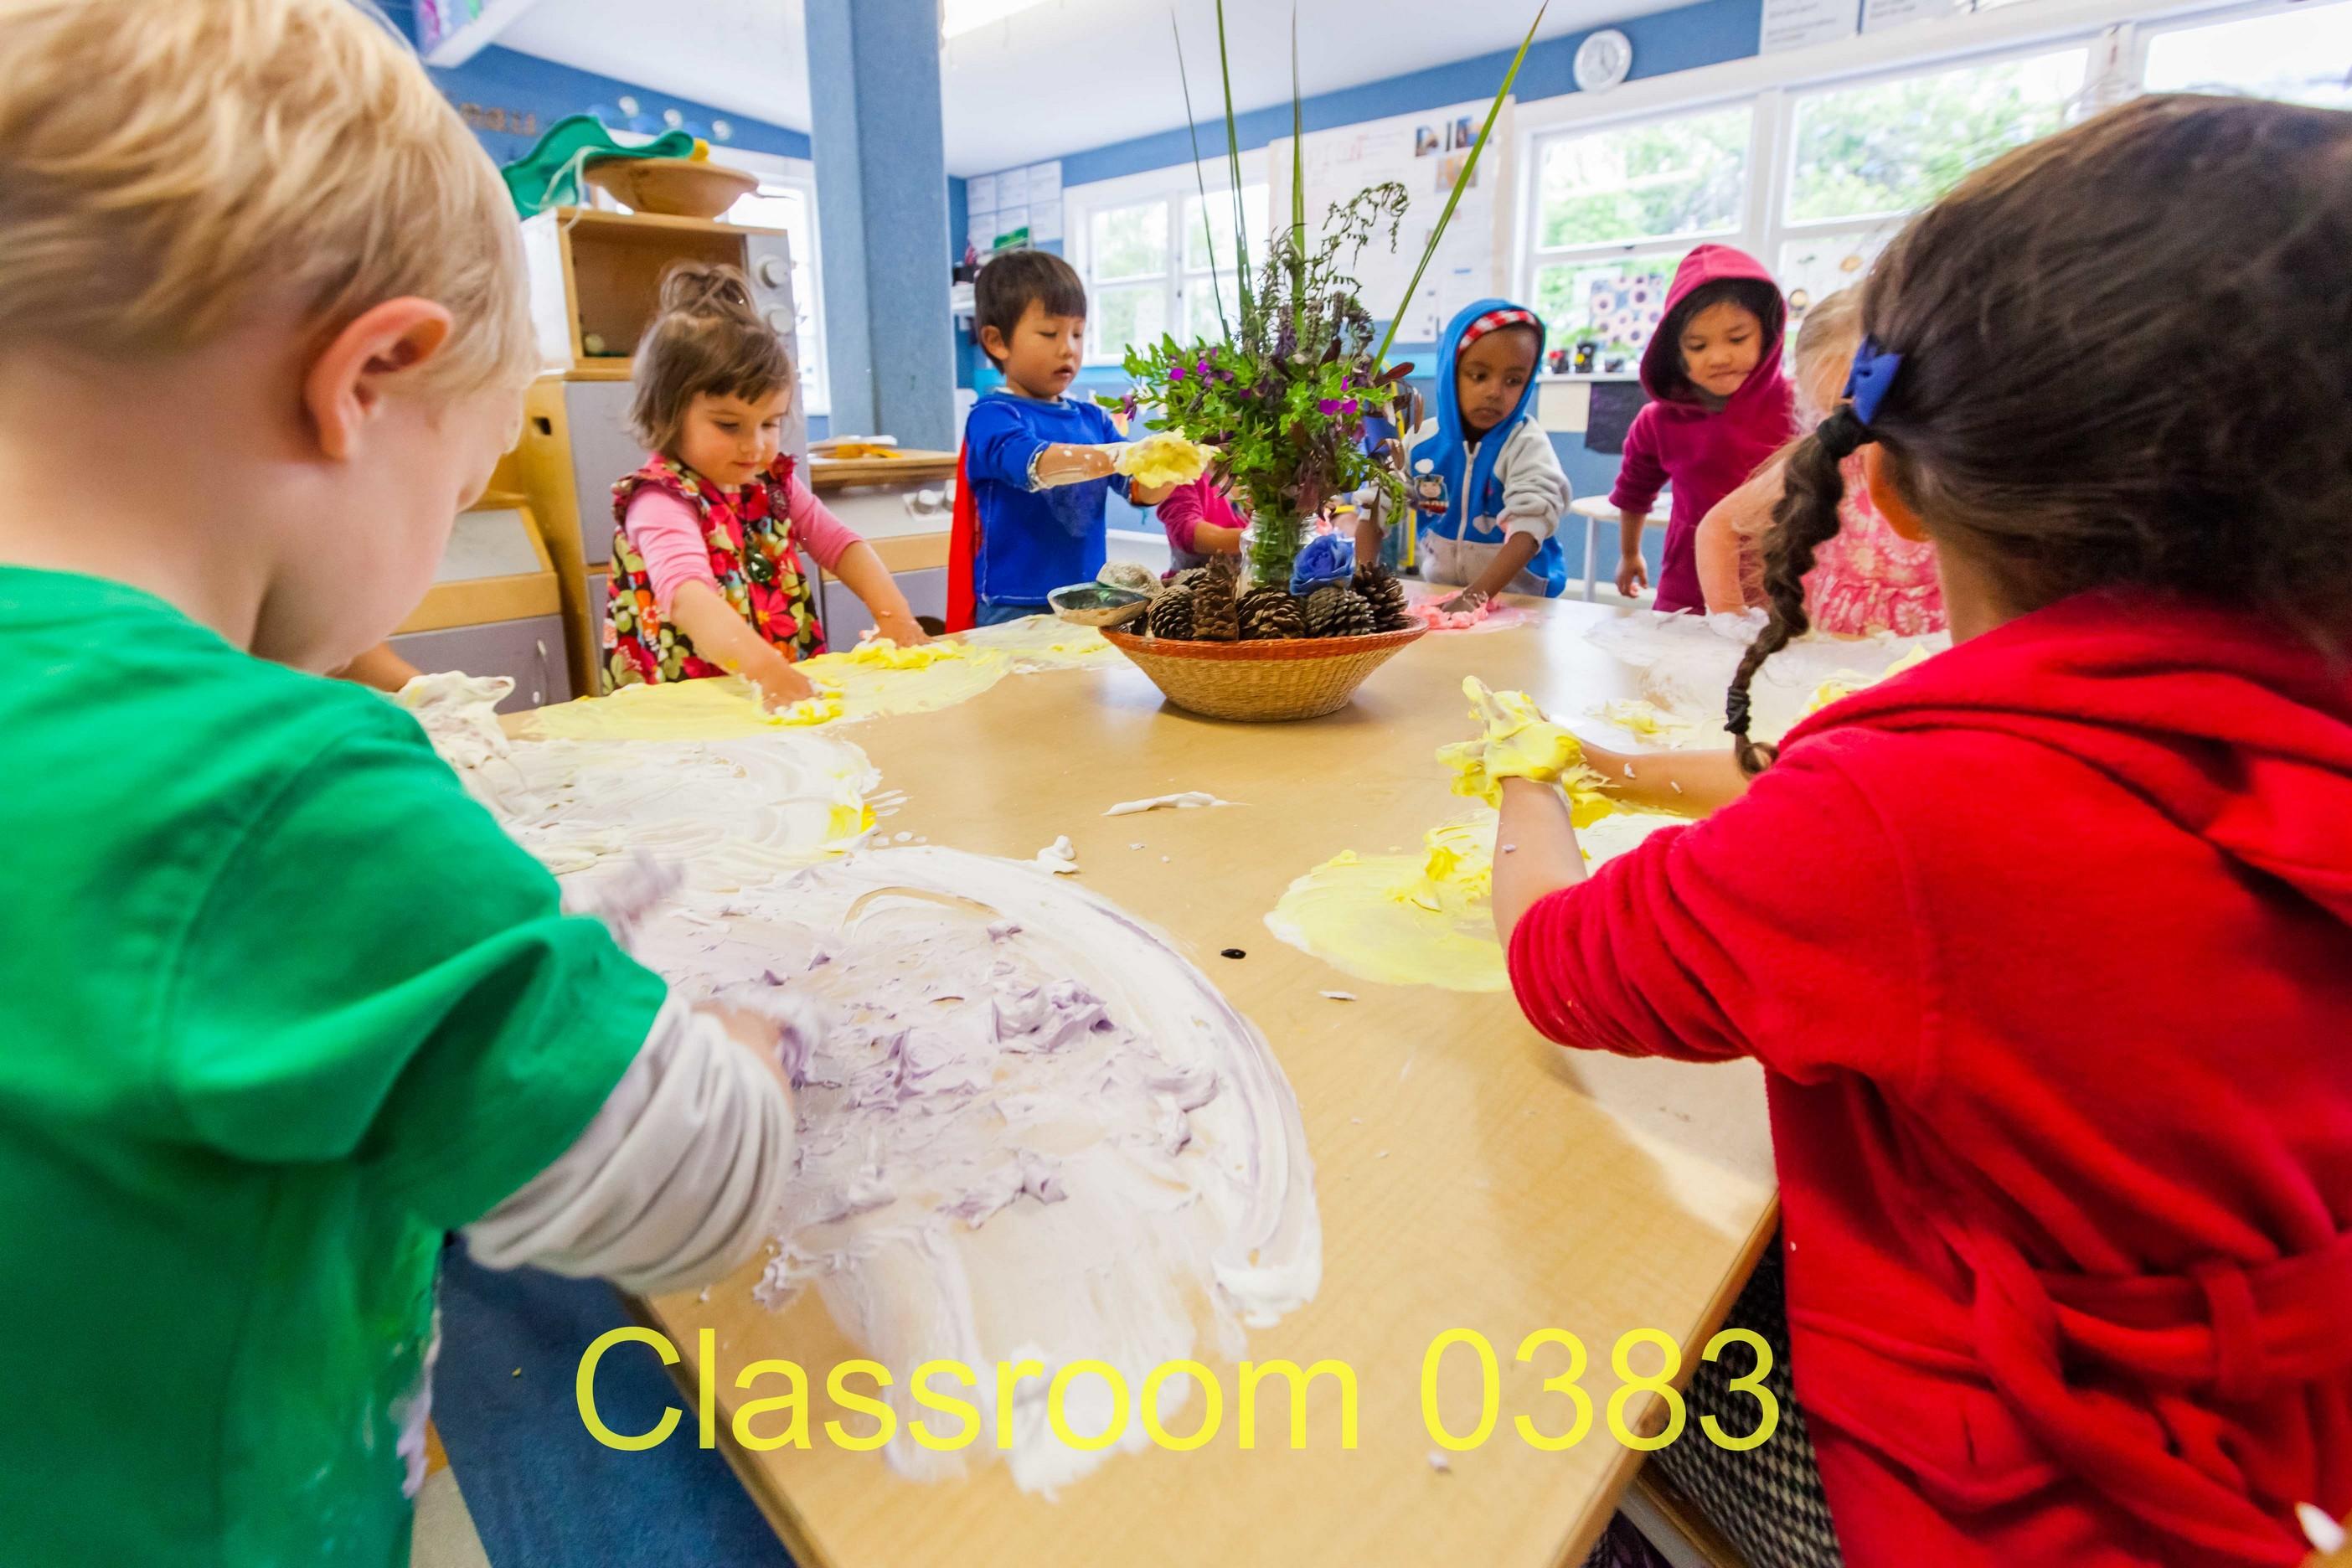 Classroom 0383